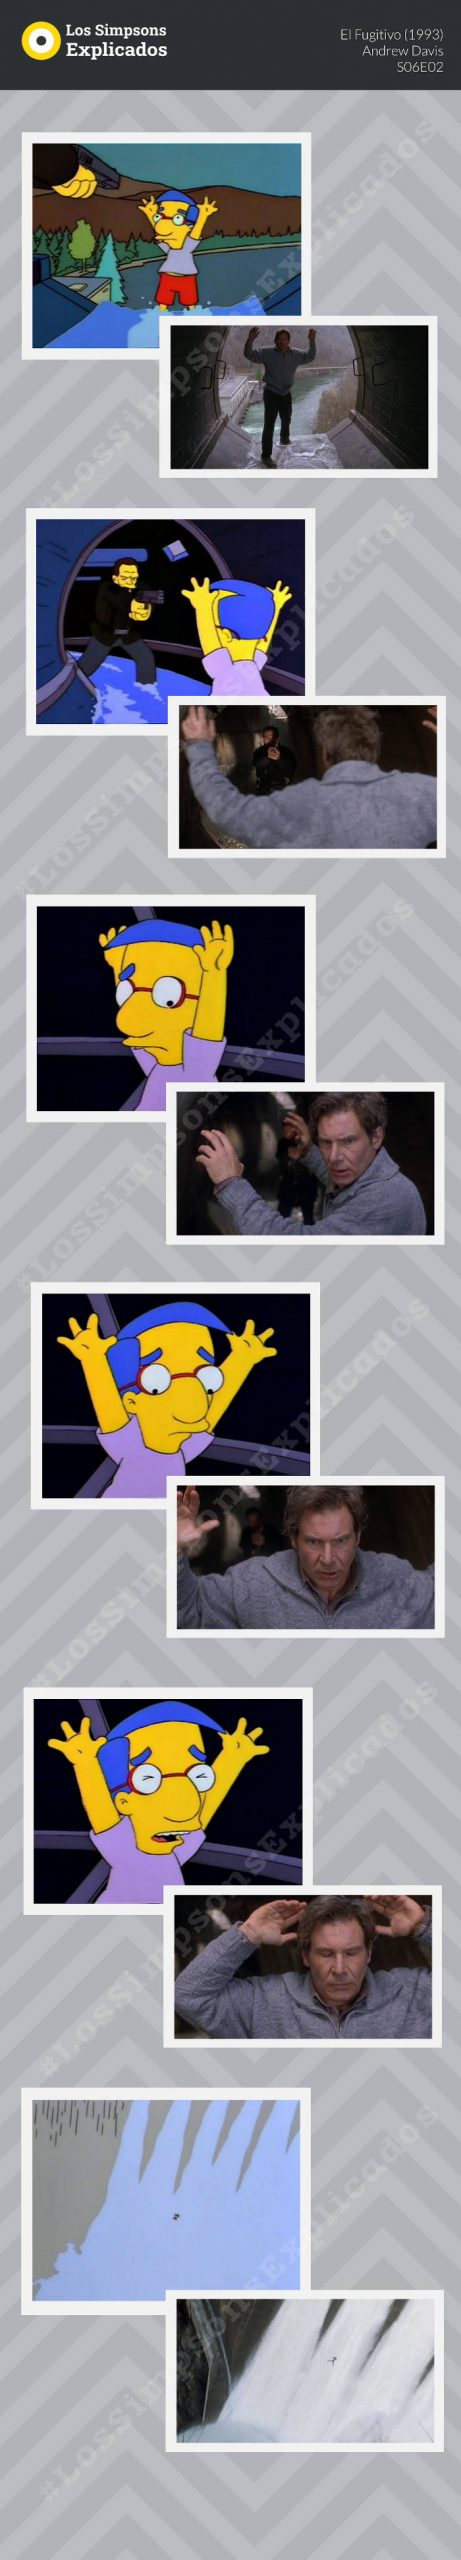 Homenaje a El Fugitivo en Los Simpsons Milhouse cascada